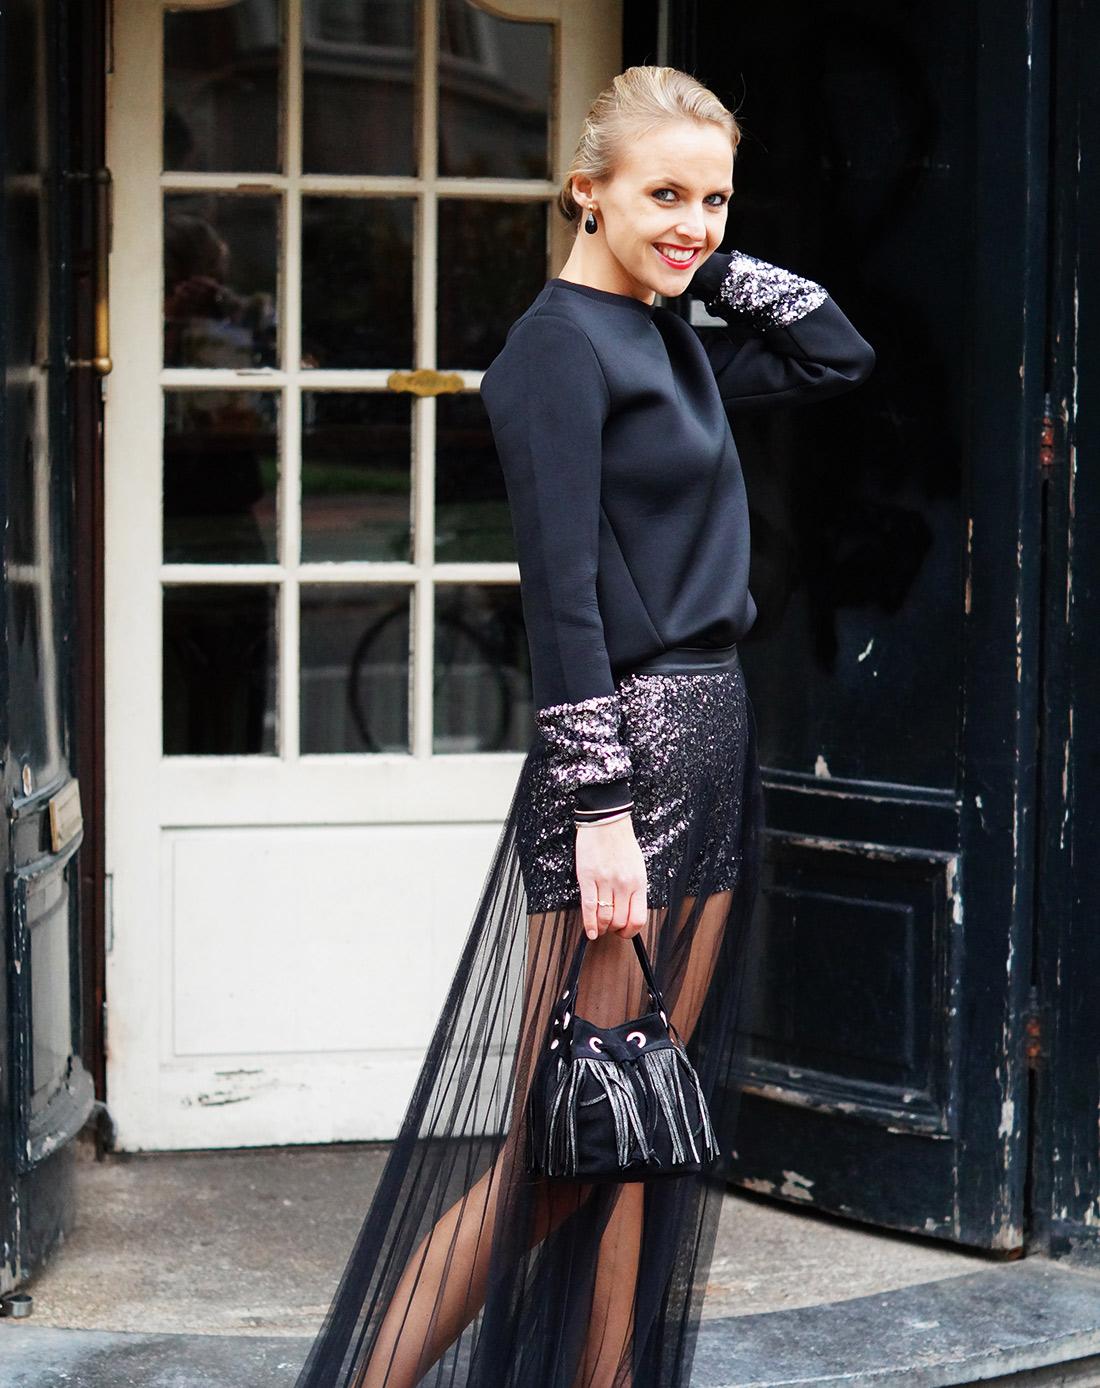 Bag-at-You---Fashion-blog---Christmas-Holiday-Outfit